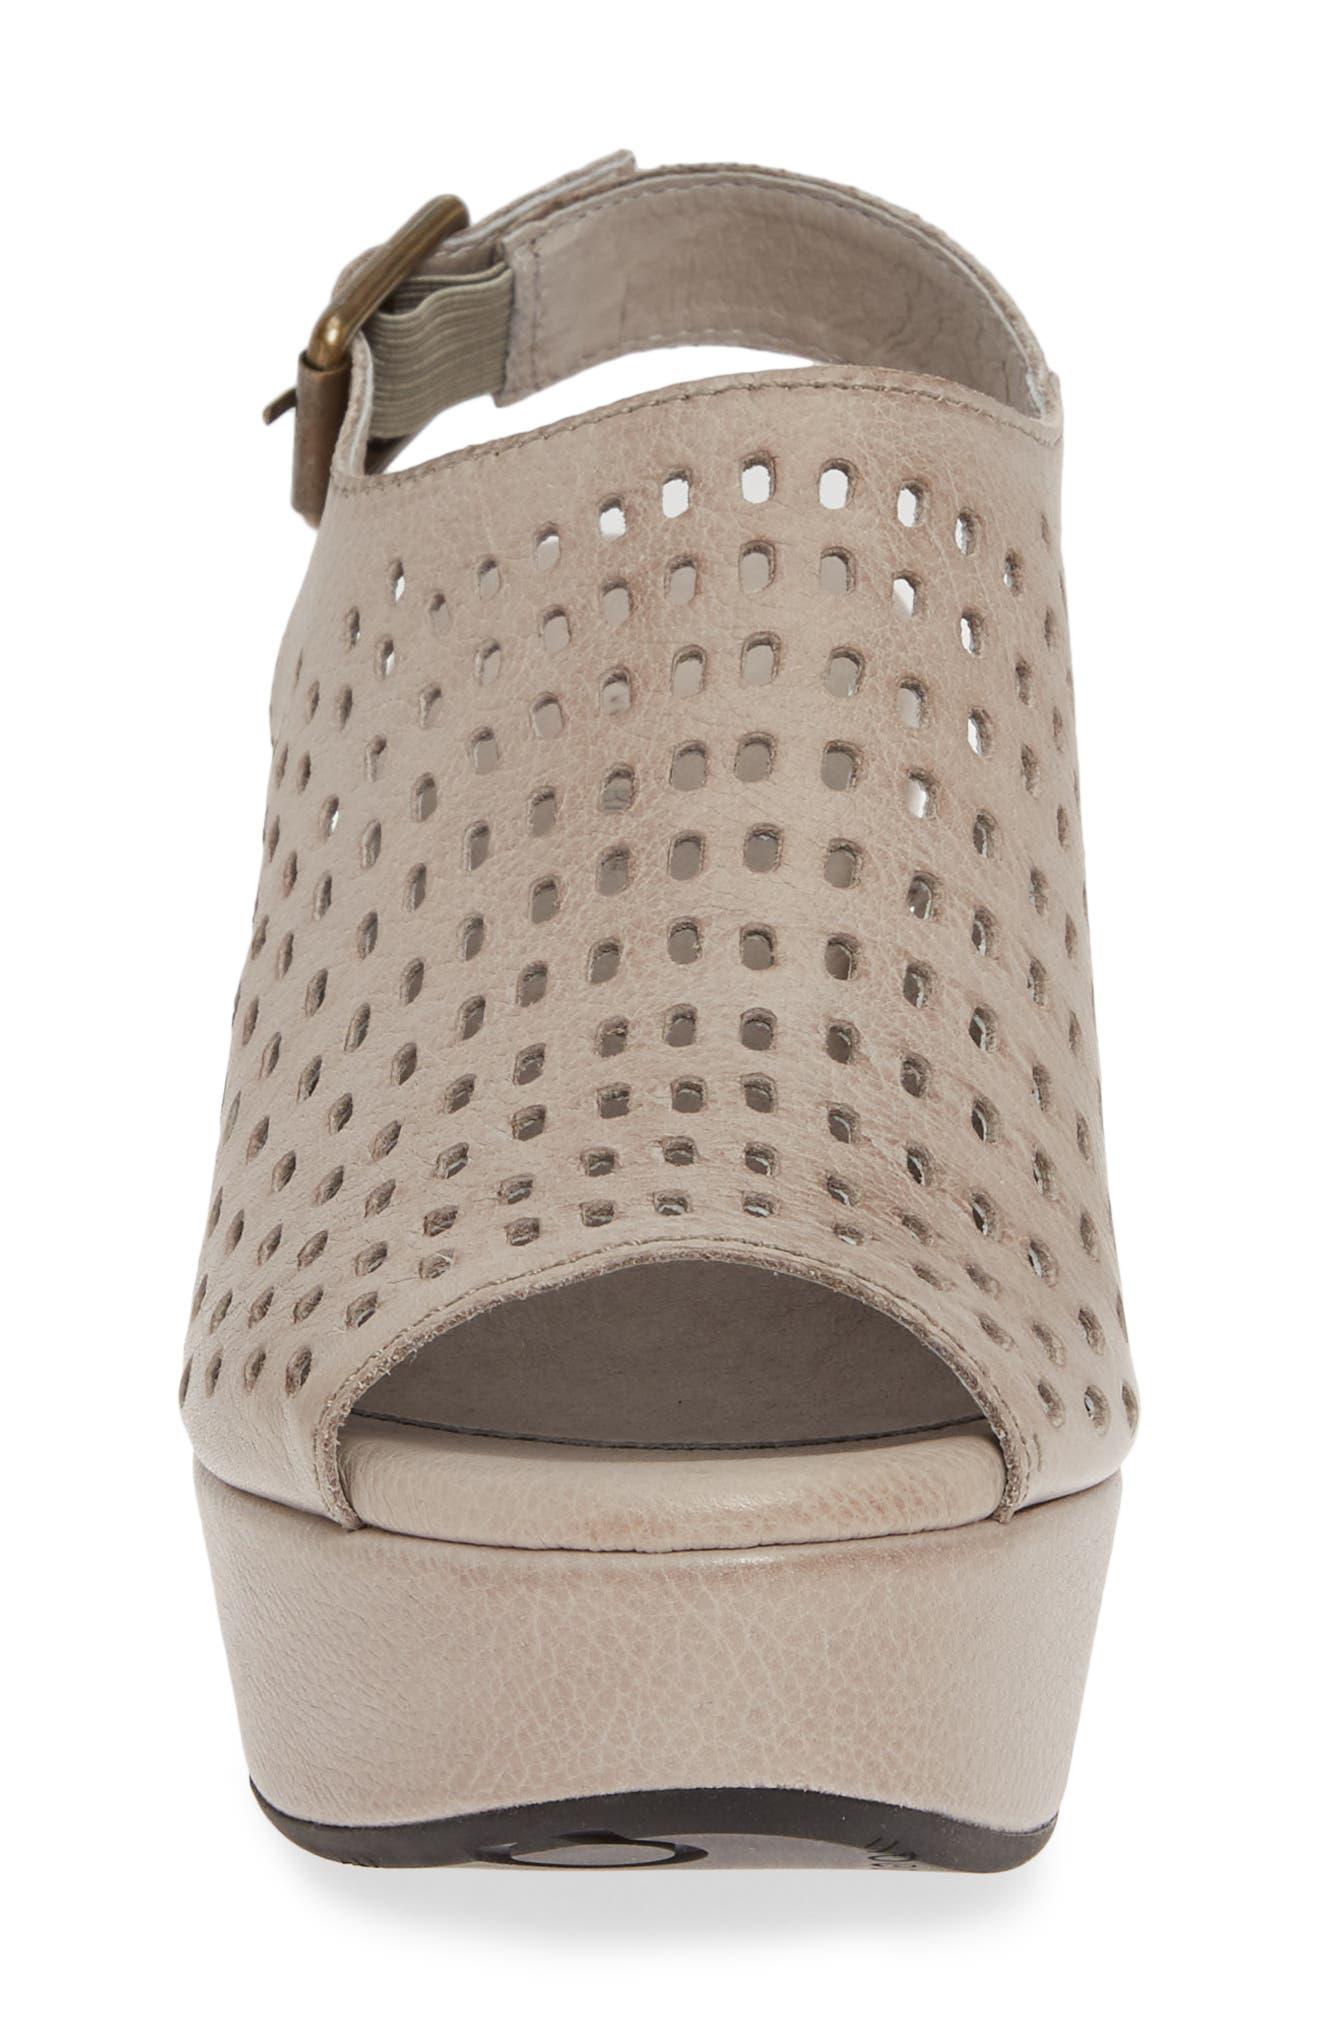 CHOCOLAT BLU, Wally Platform Wedge Sandal, Alternate thumbnail 4, color, GREY LEATHER